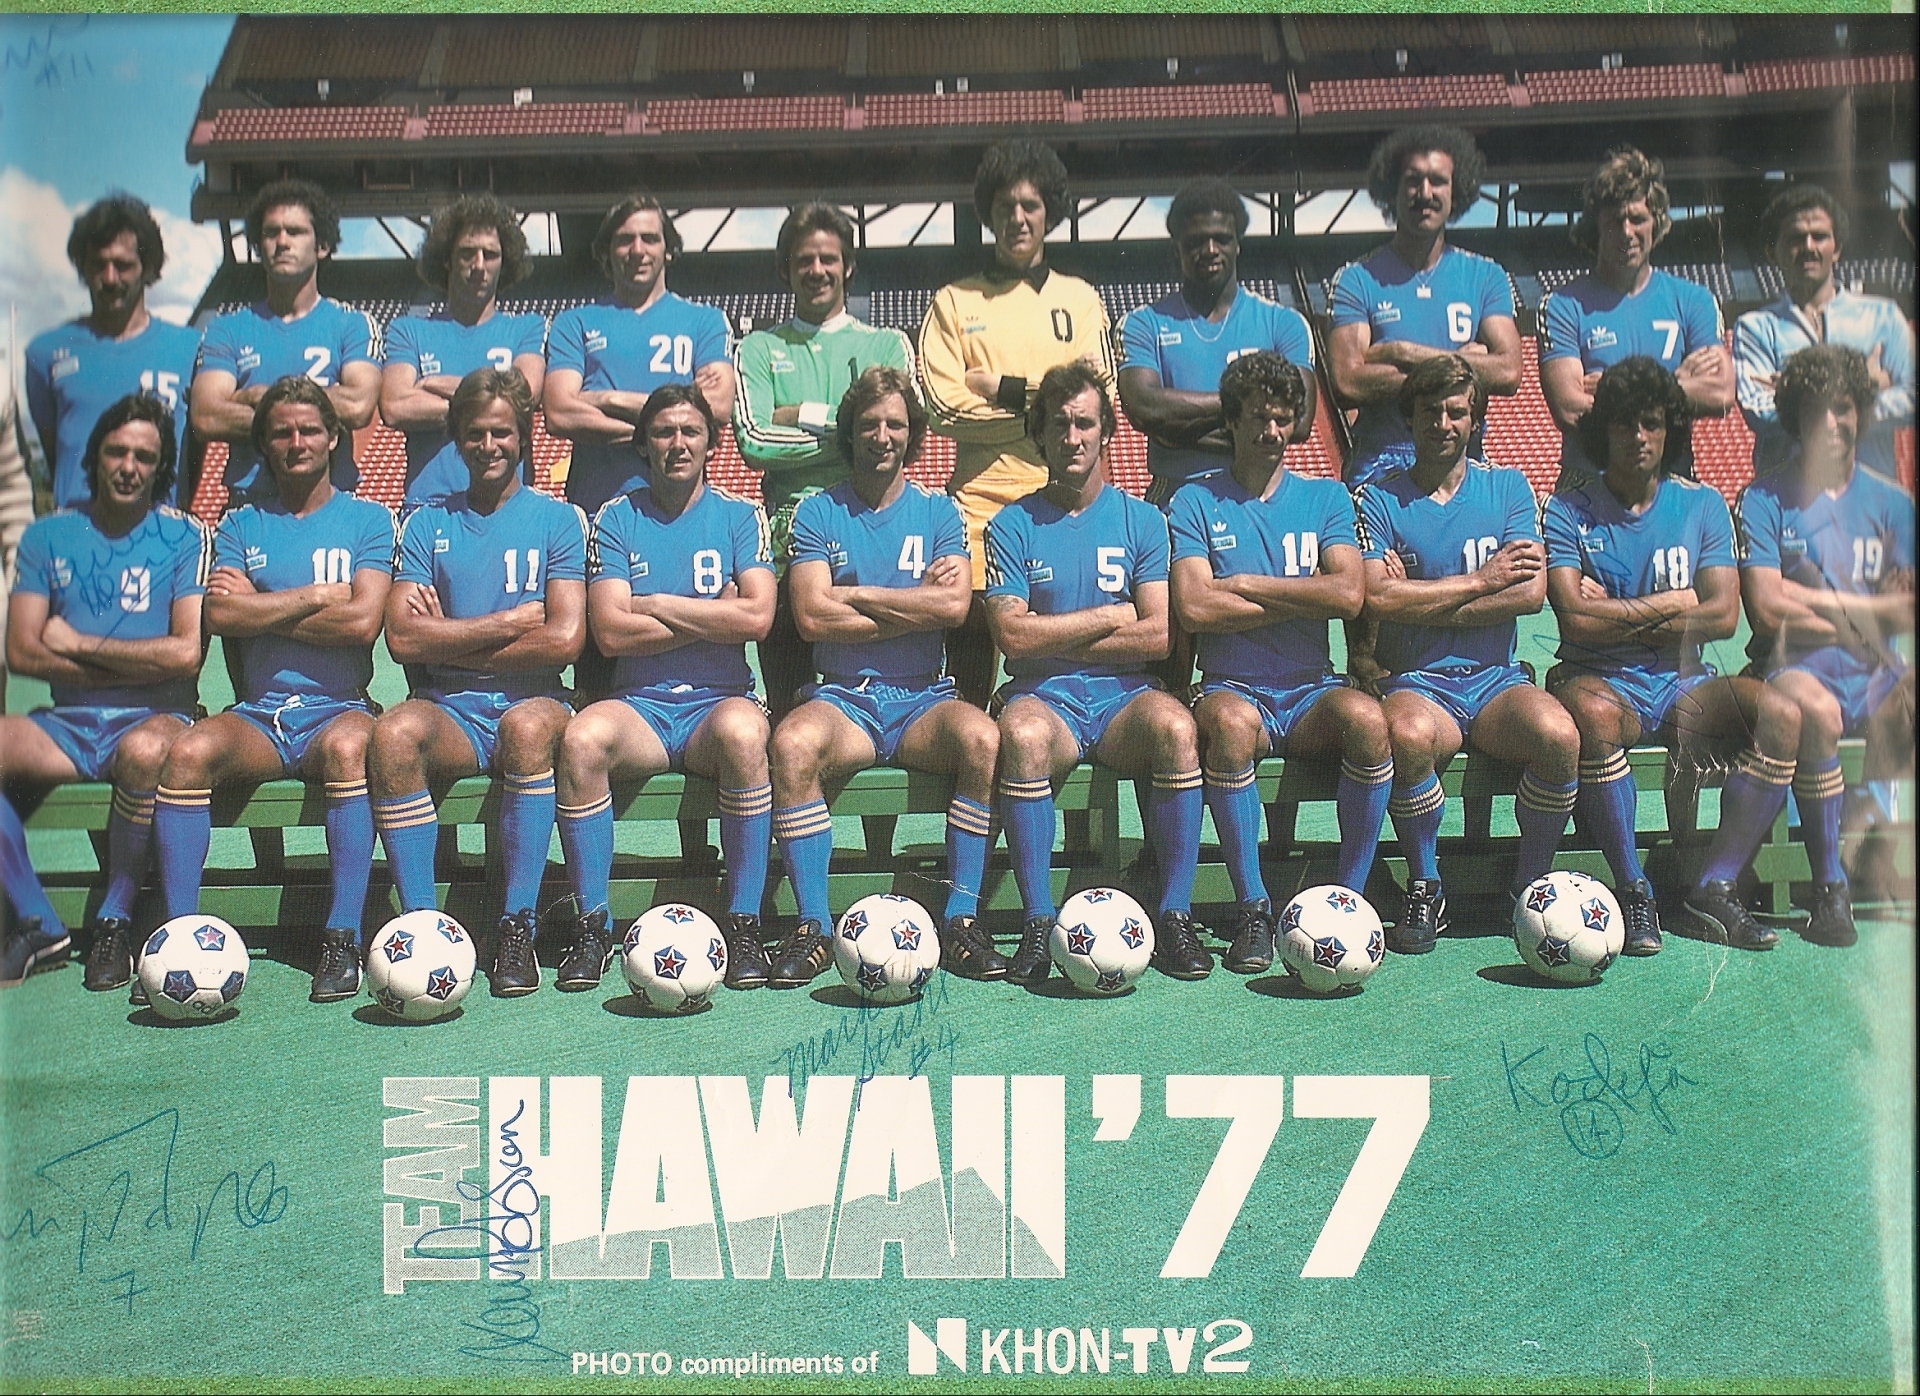 Team Hawaï.jpg